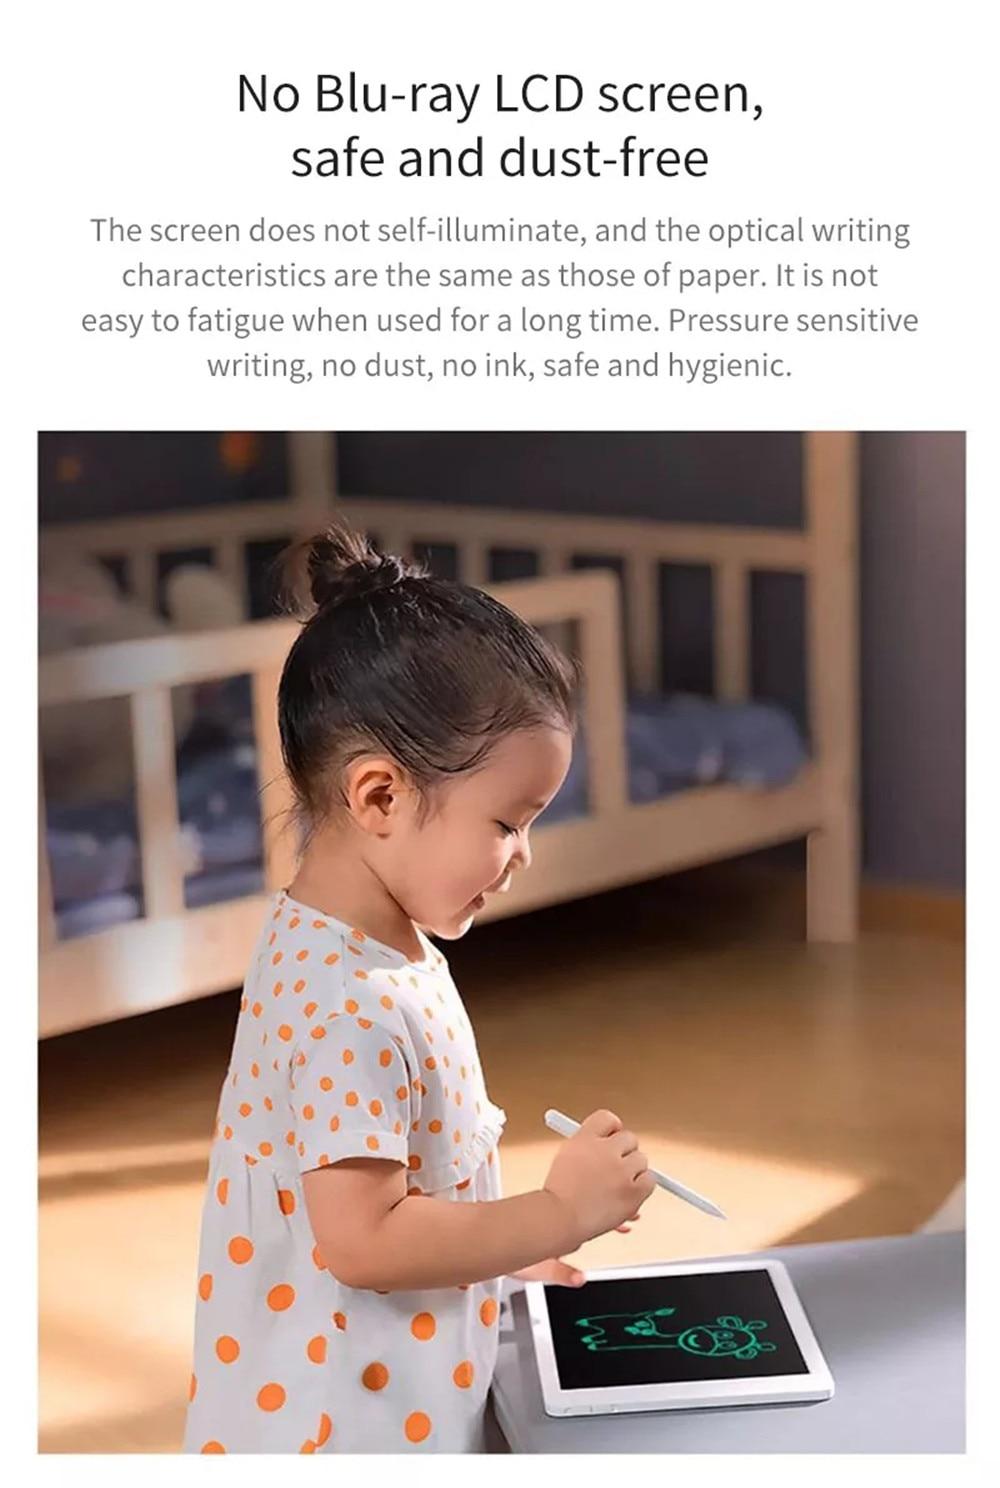 Xiaomi Mijia LCD Writing Tablet 7